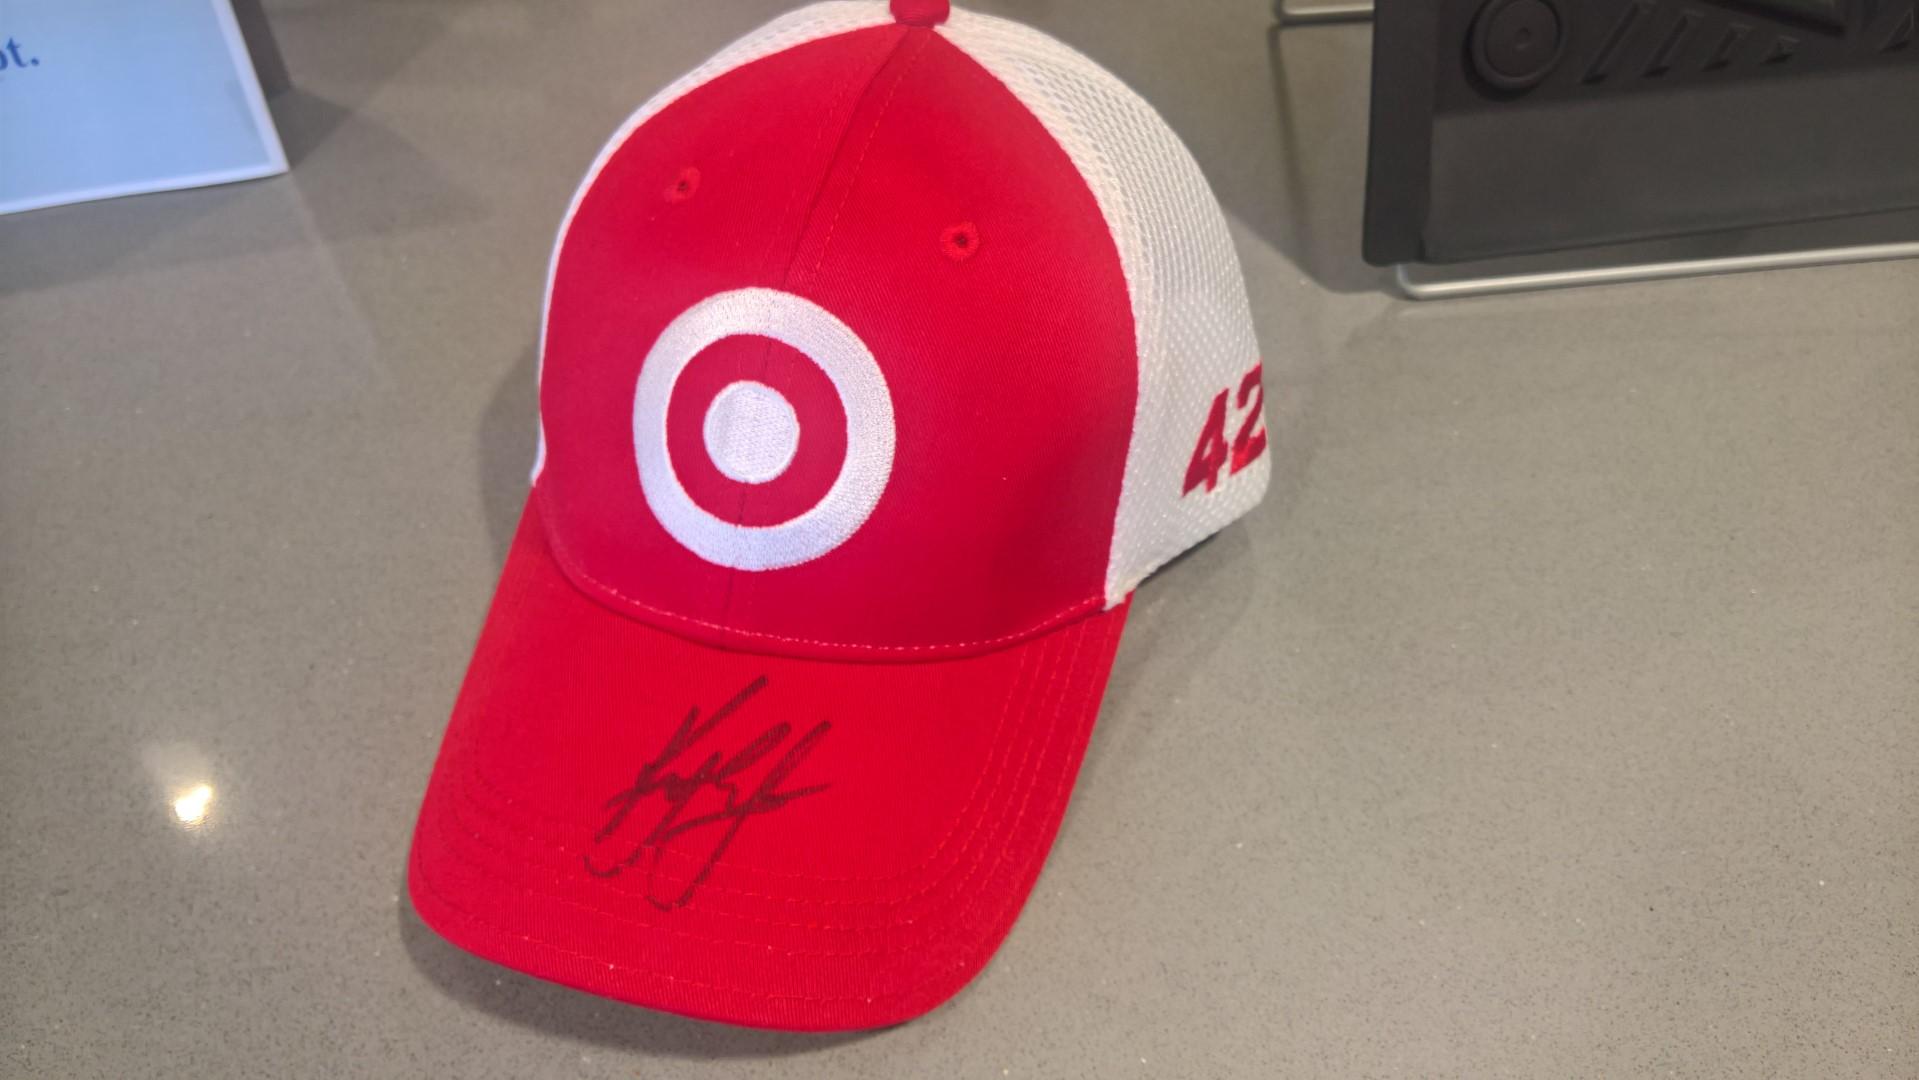 Signed Target Baseball Cap by Kyle Larson